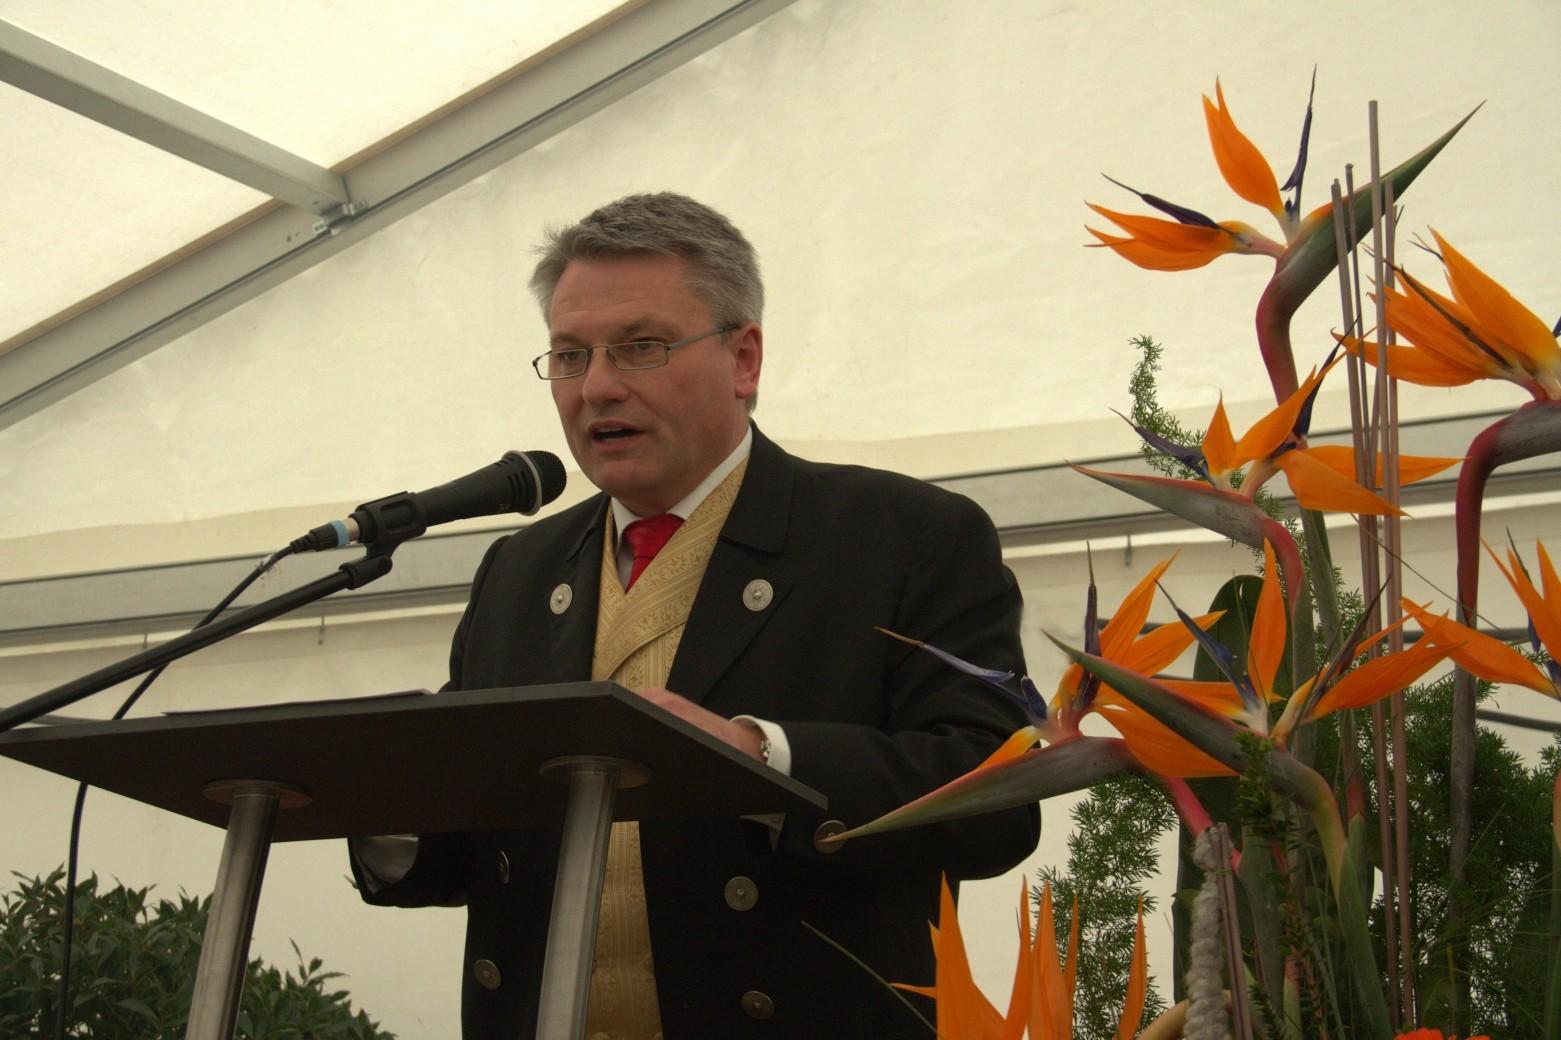 Hans Henninger, Bürgermeister, Flachslanden